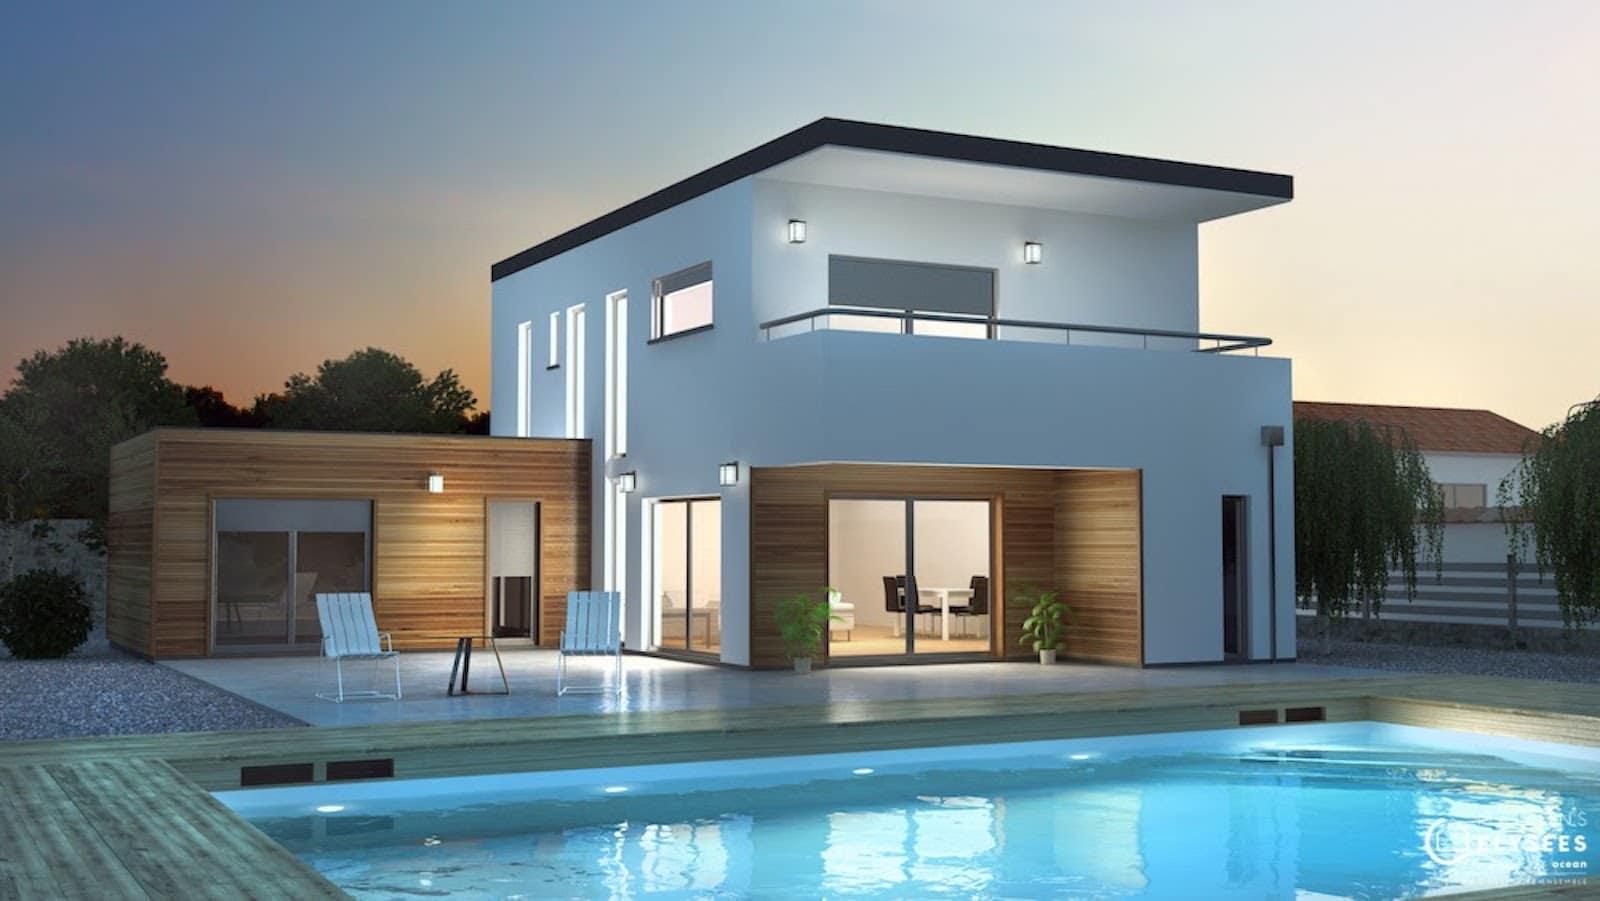 Achat appartement : comment effectuer un achat appartement ?